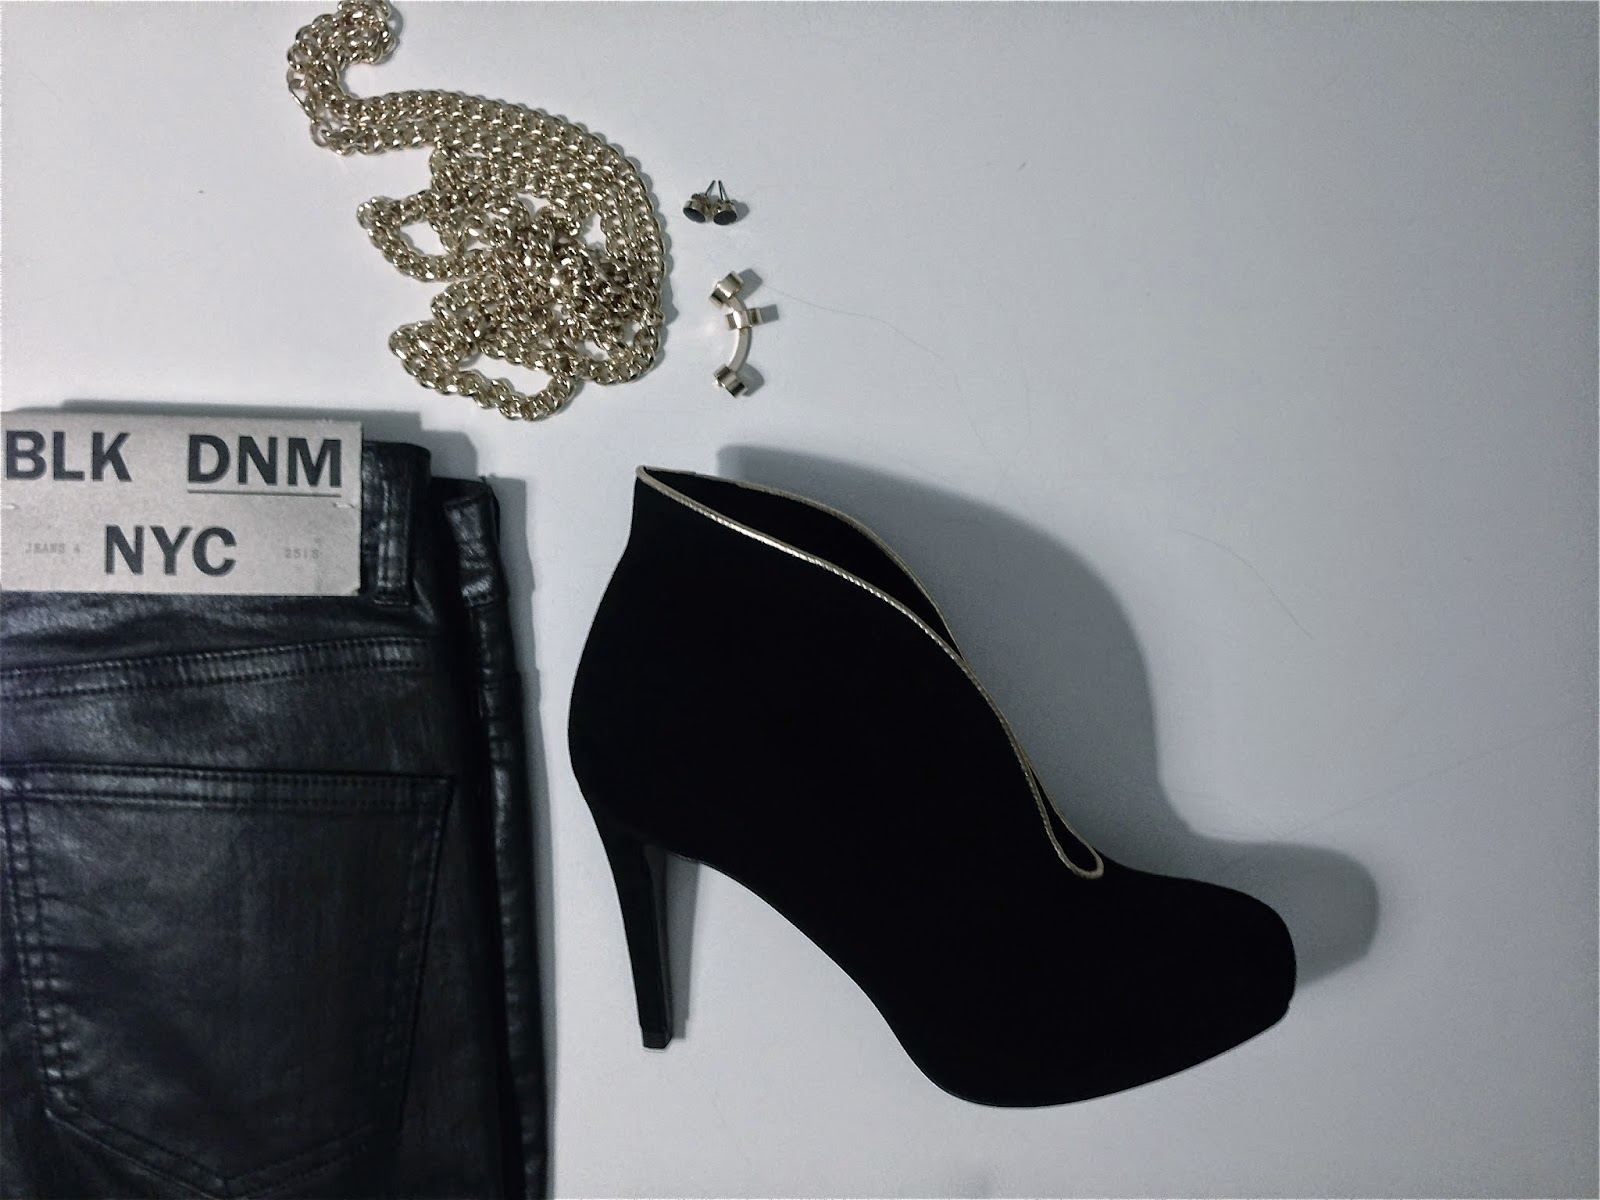 BLK  DNM,  Mentorfootwear, H&M